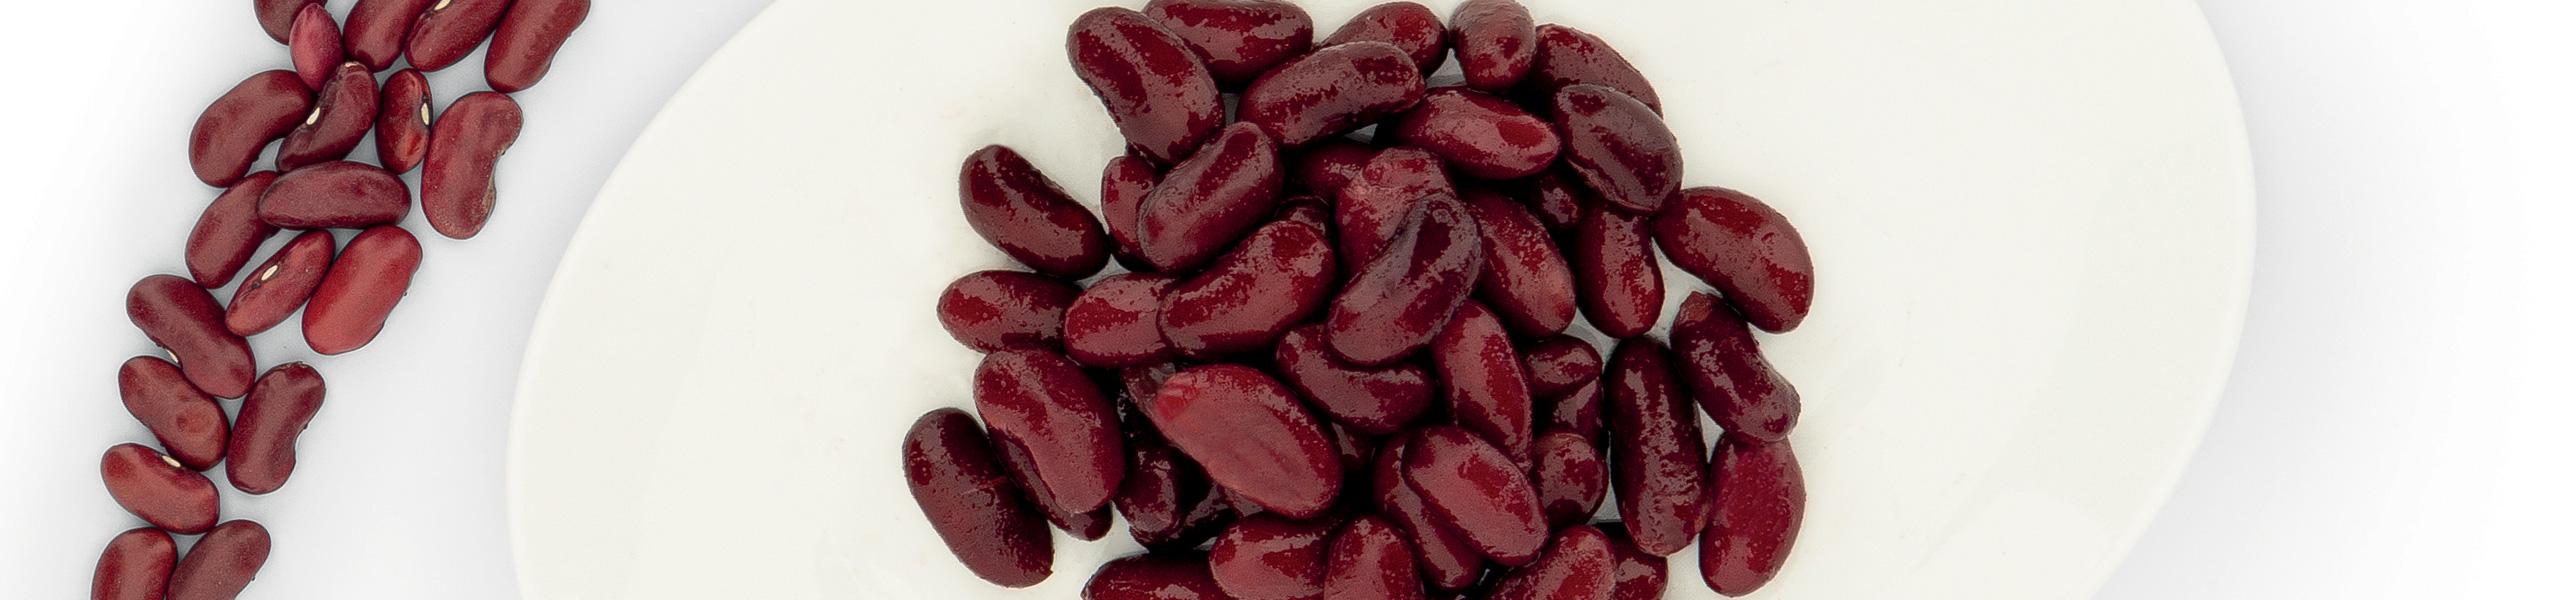 Fagioli Red Kidney al naturale